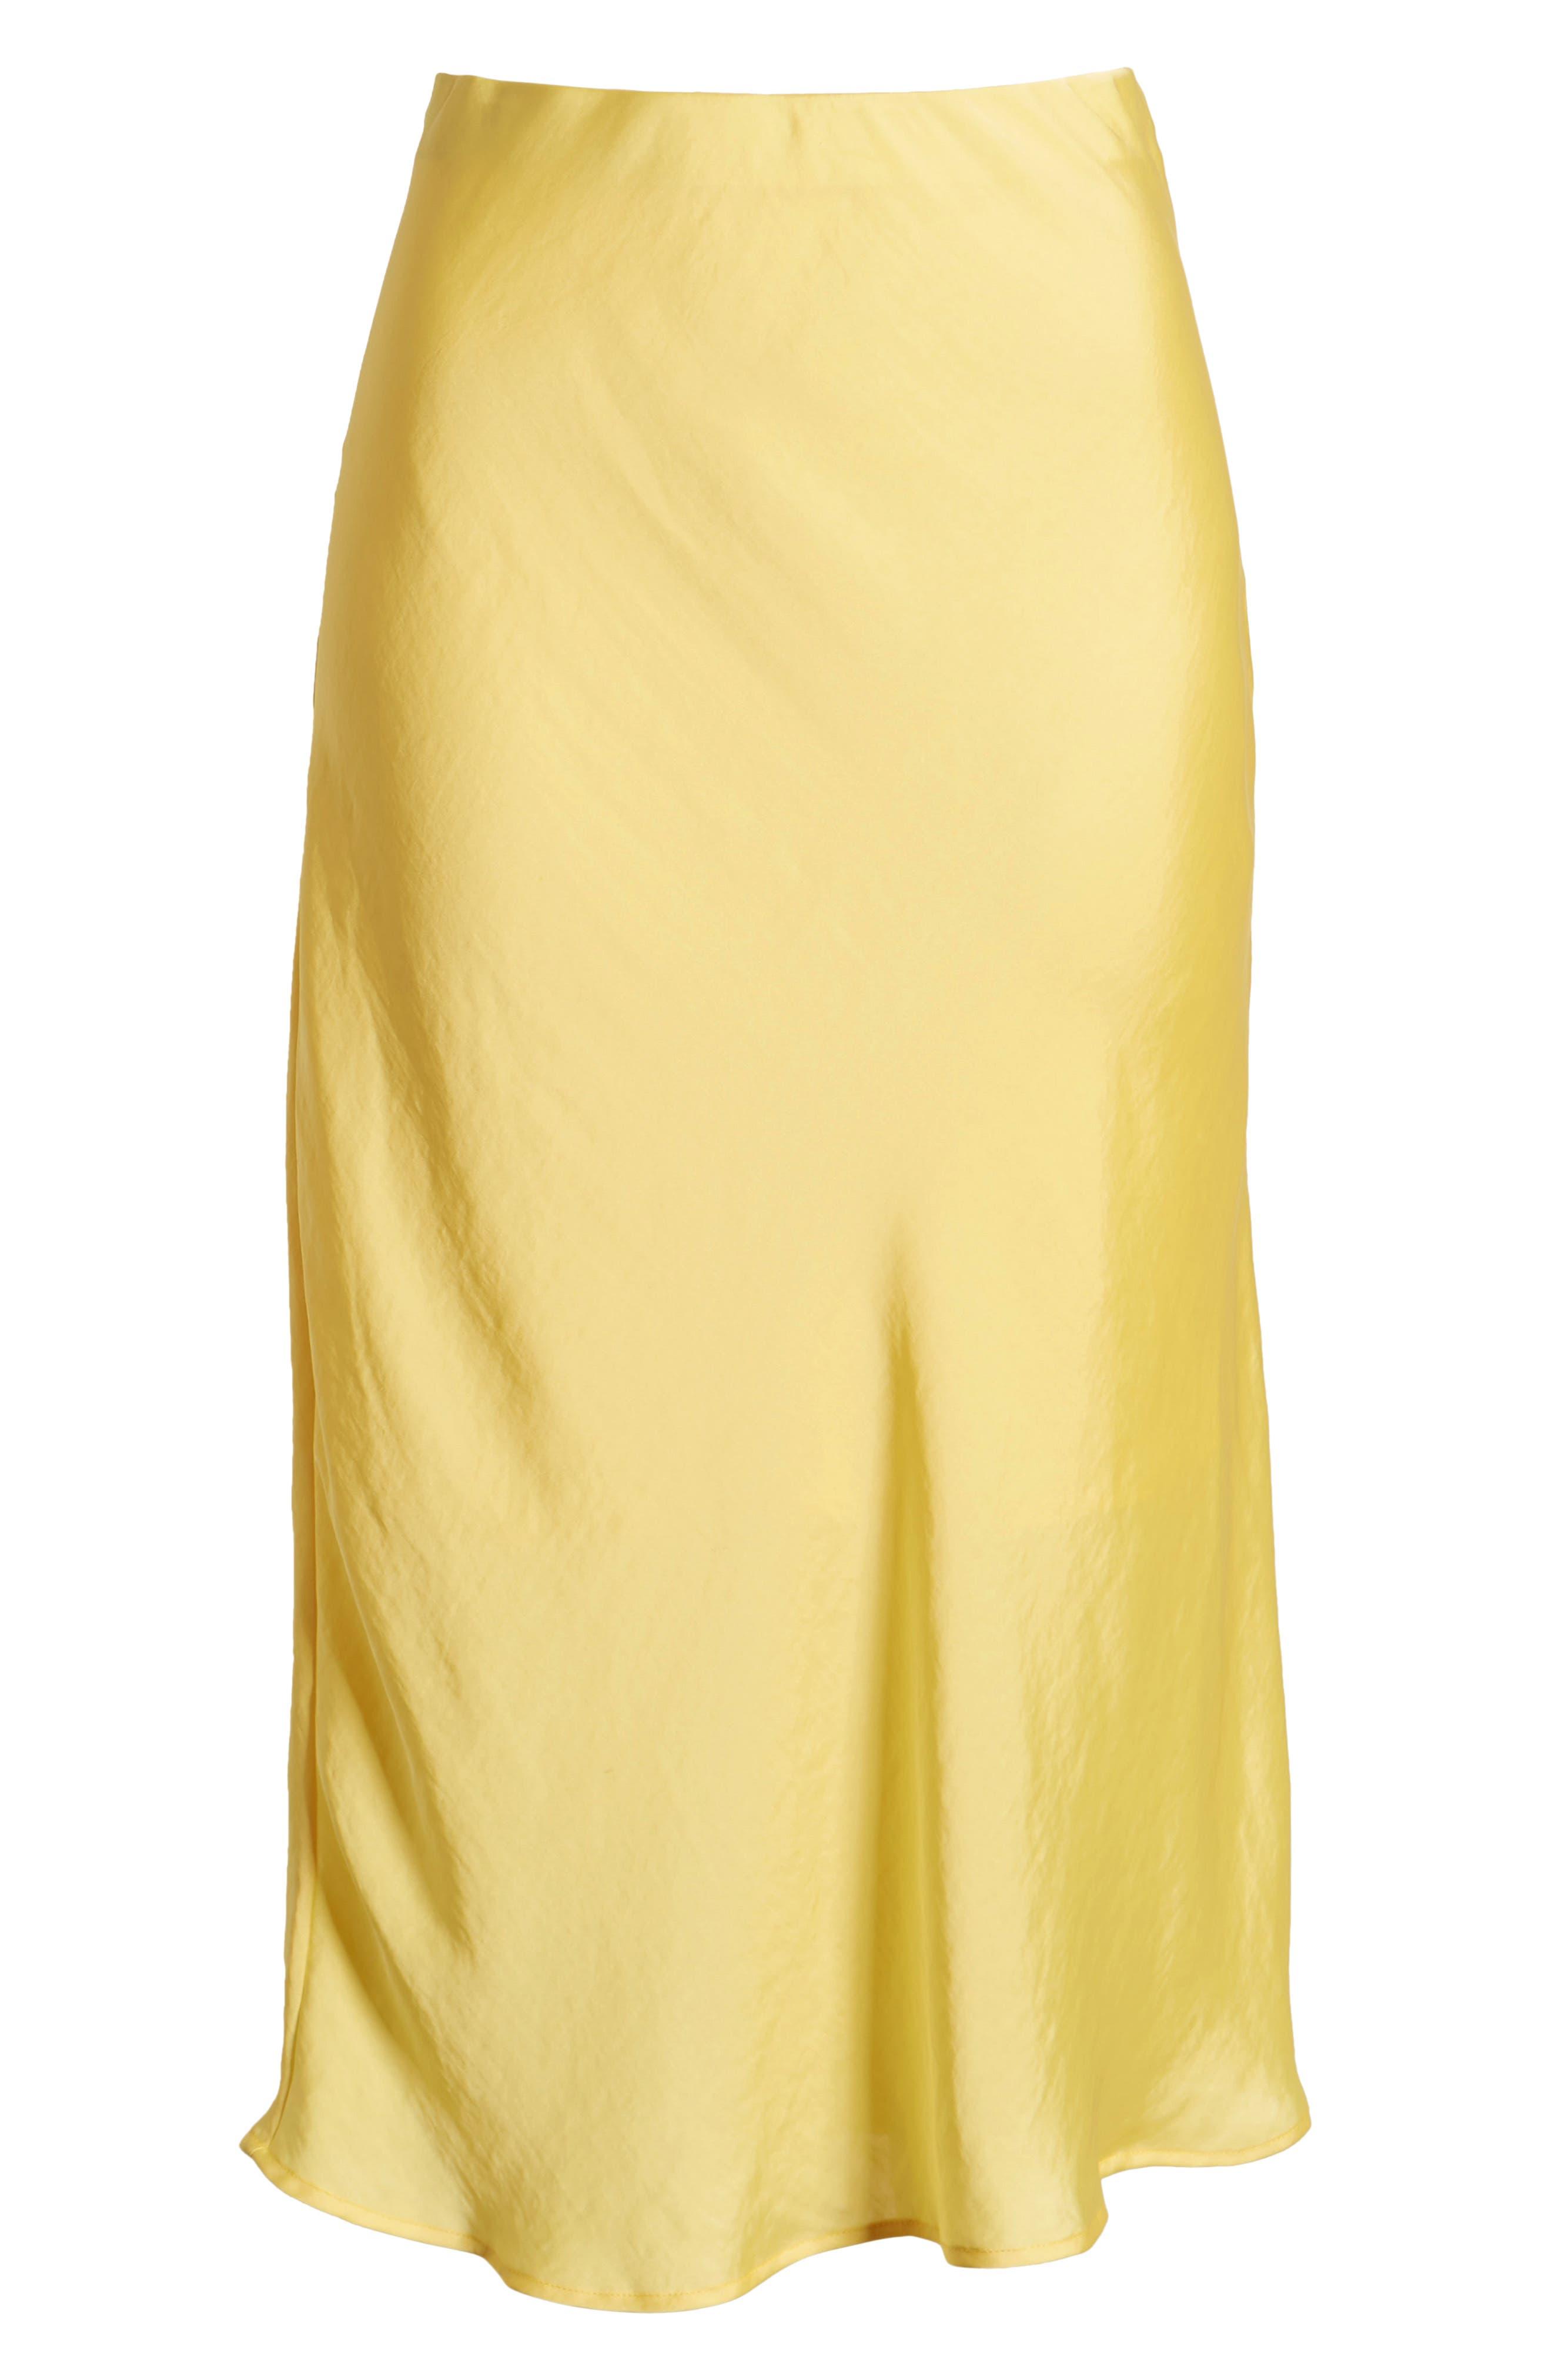 LEITH, Satin Midi Skirt, Alternate thumbnail 6, color, YELLOW MERINGUE